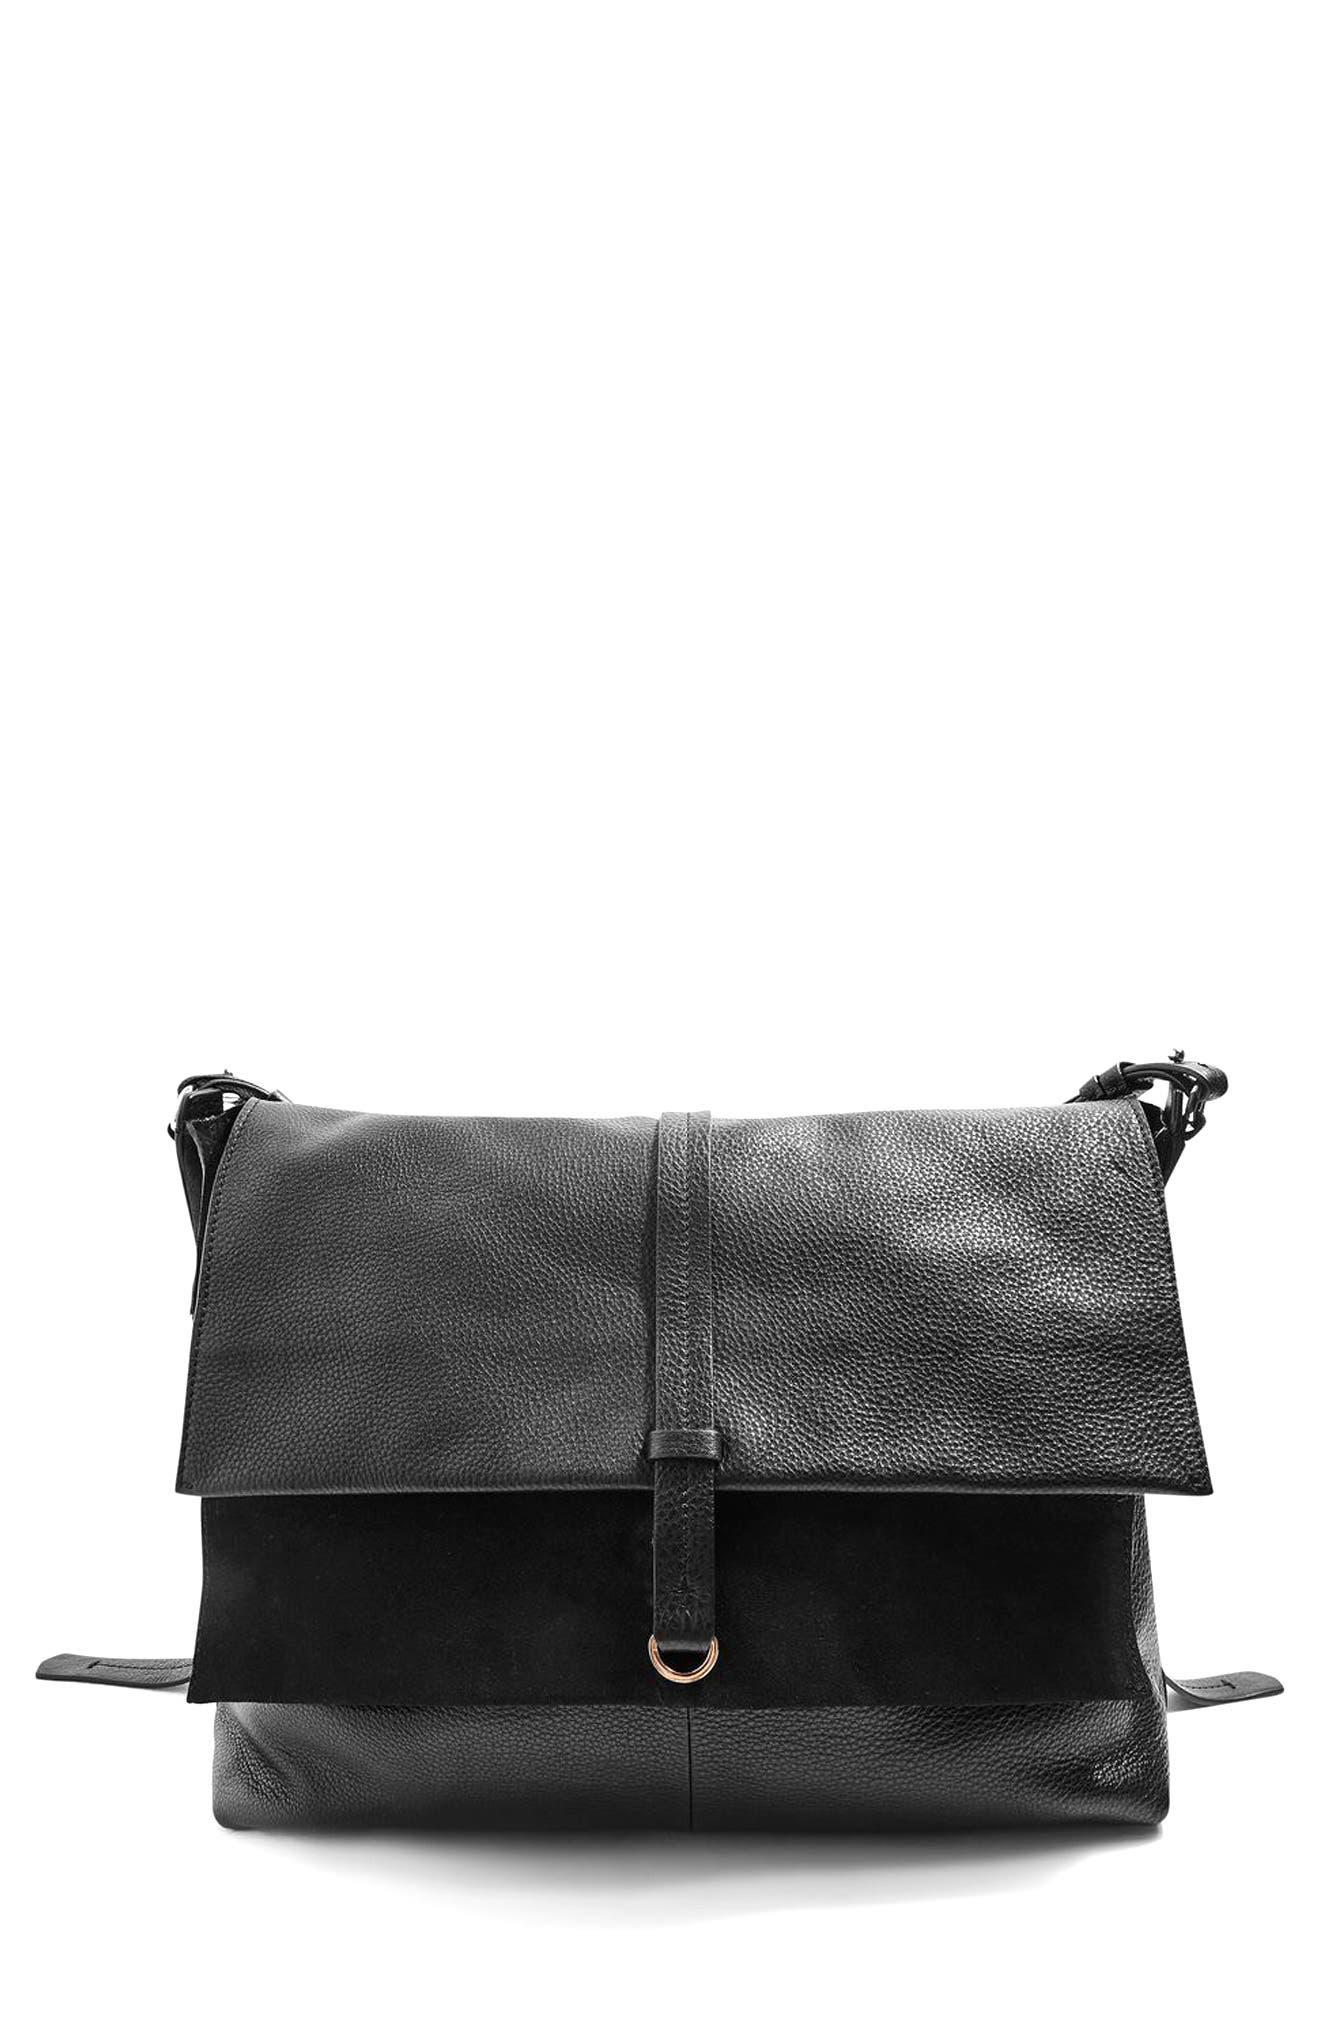 Main Image - Topshop Premium Leather Hobo Bag